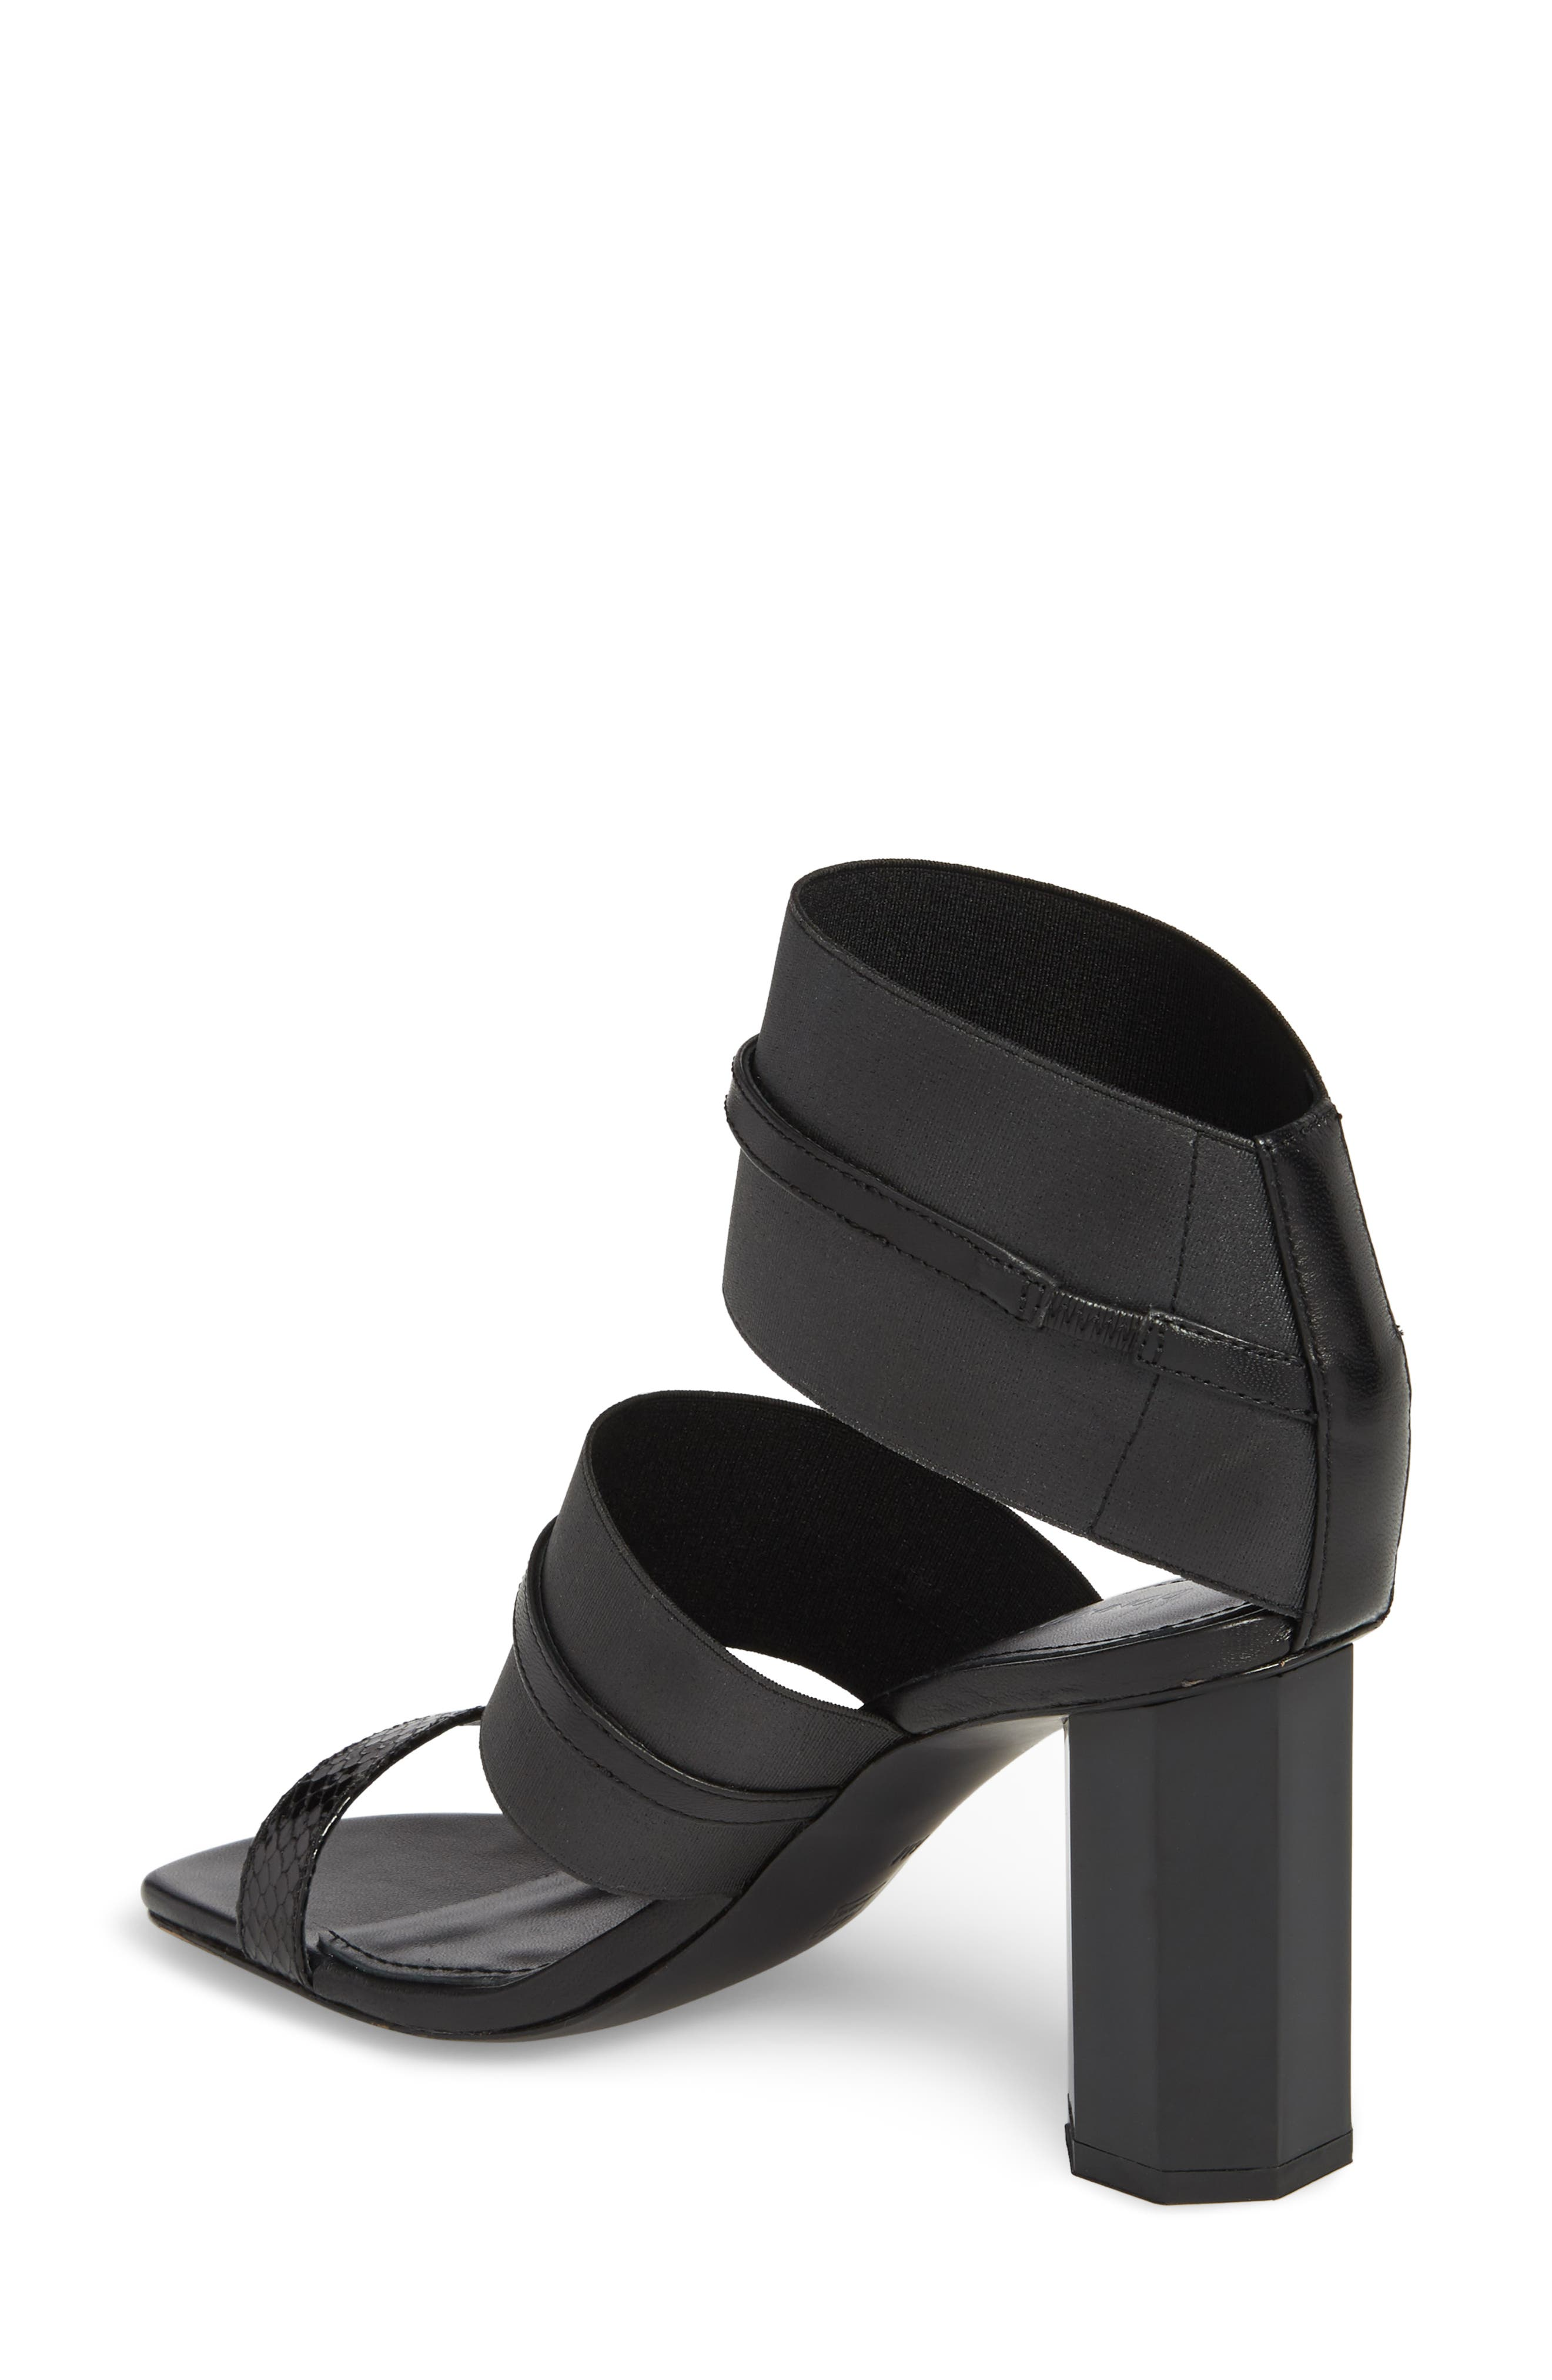 Edie Sandal,                             Alternate thumbnail 2, color,                             Black Leather